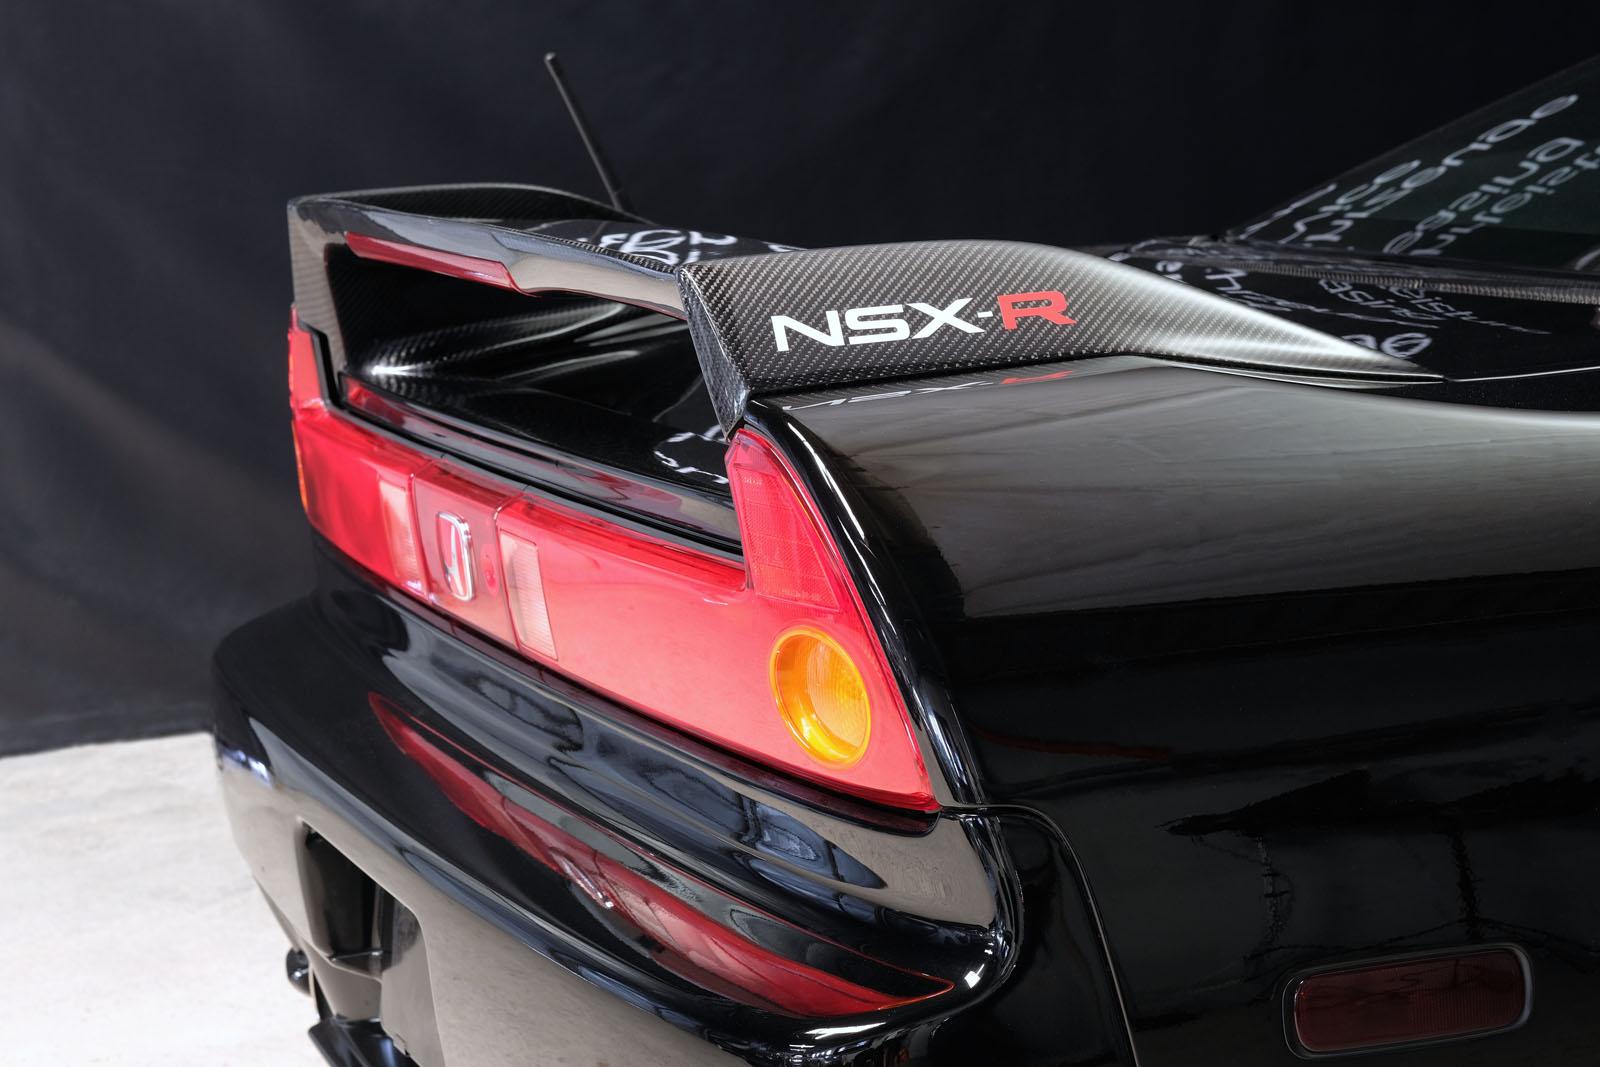 Honda_NSX_Schwarz_Schwarz_HON-0174_5_w